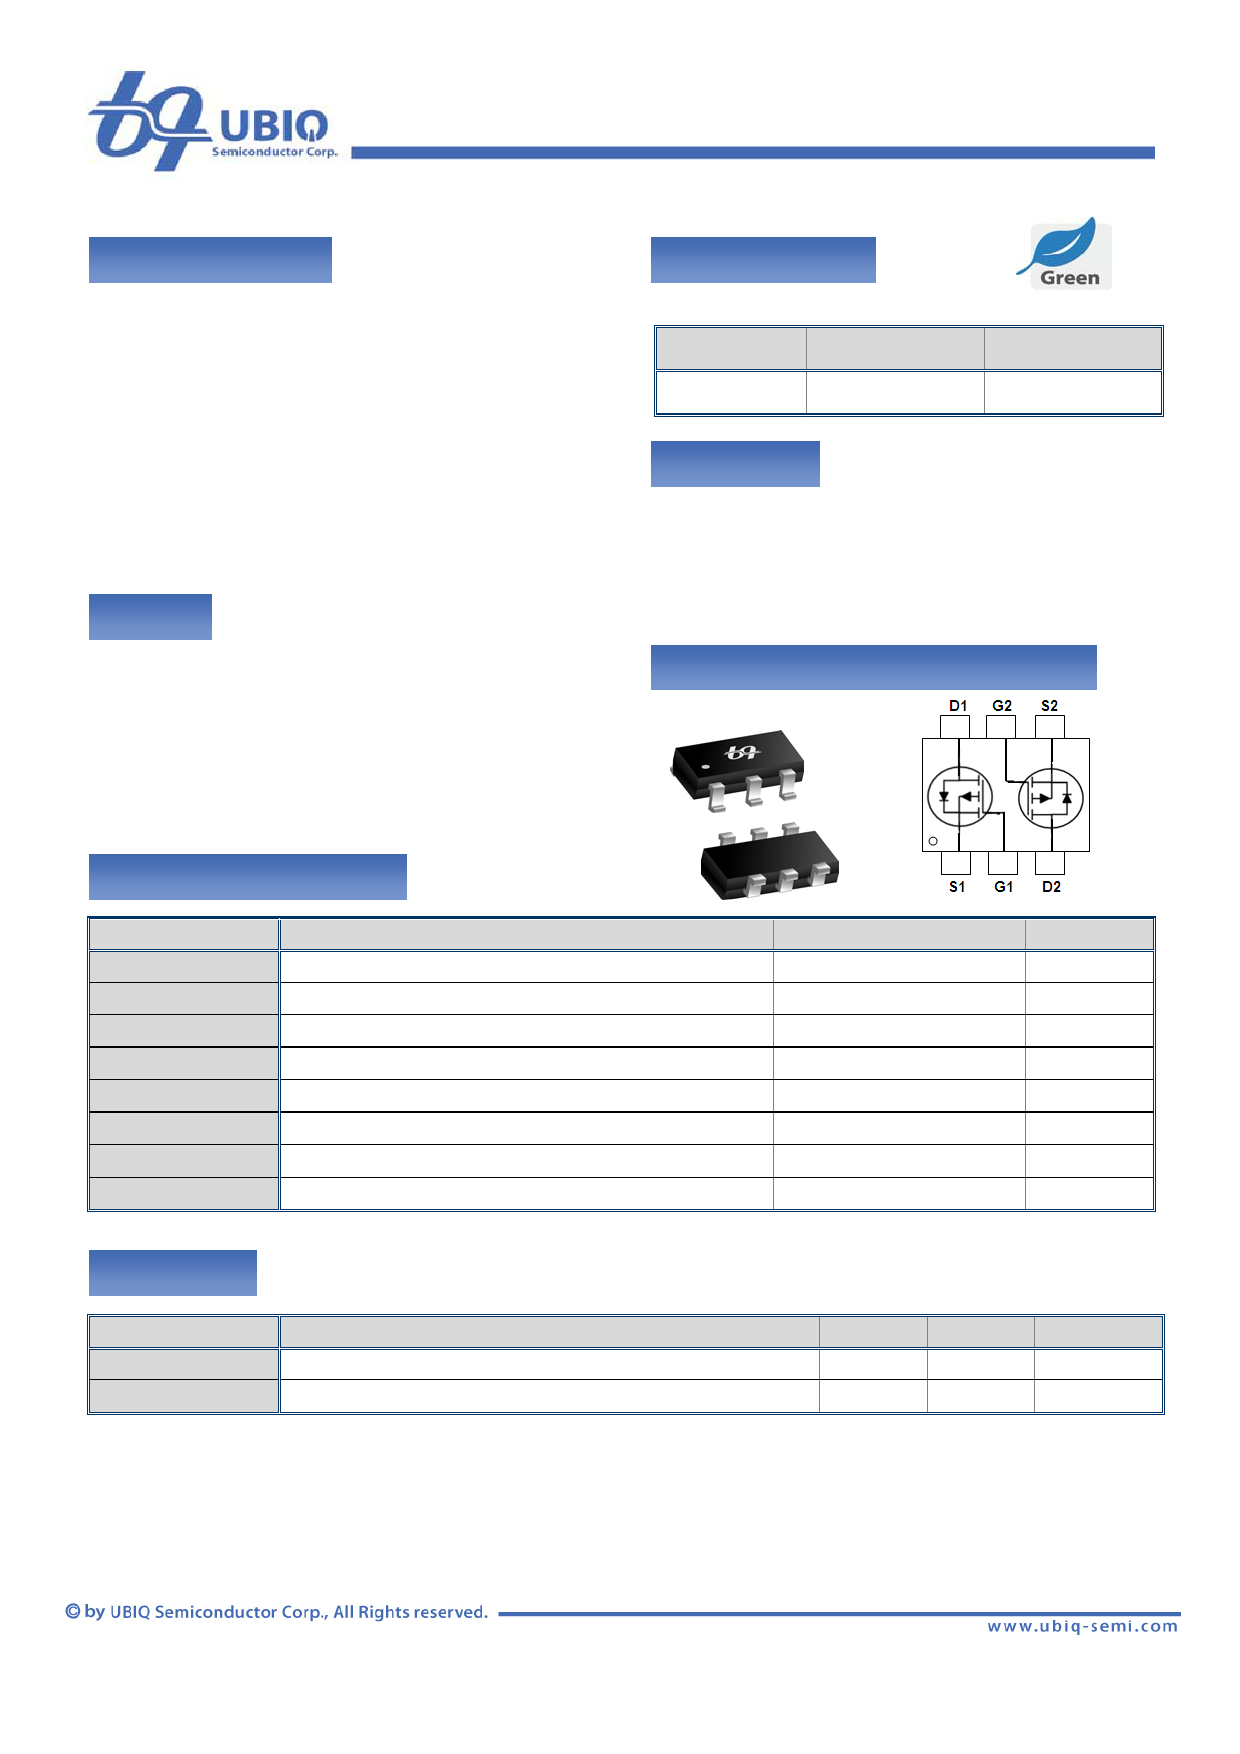 QM2517C1 Datenblatt PDF